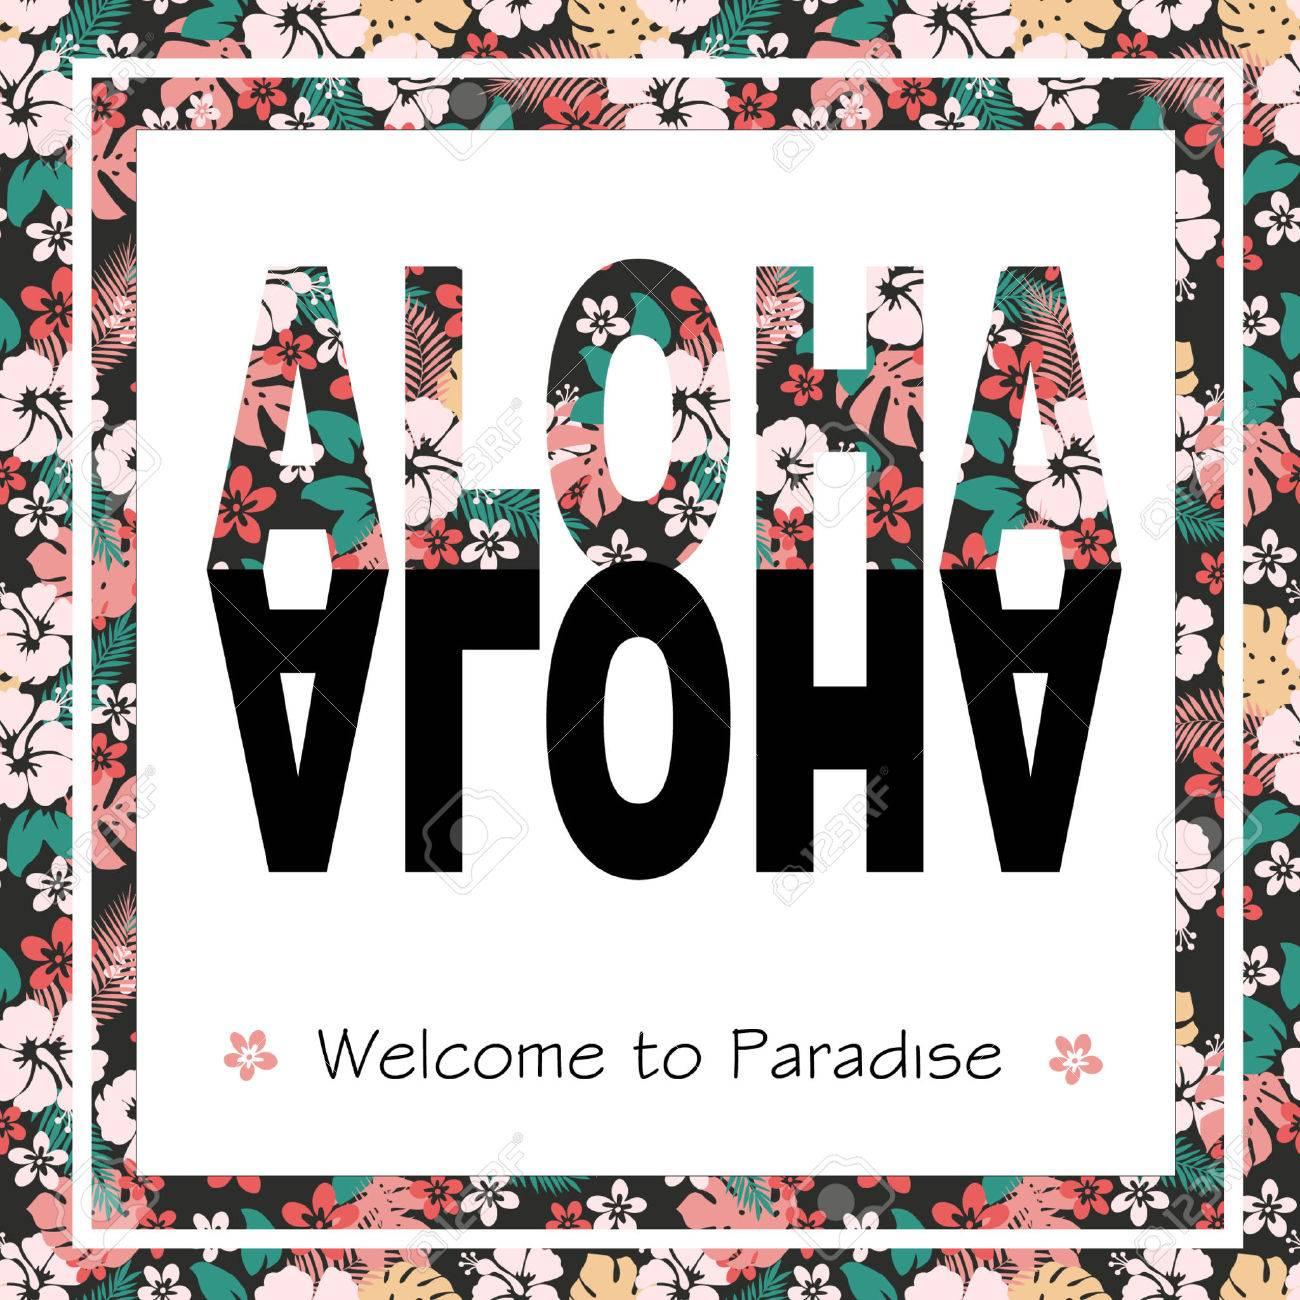 Vintage tropical exotic Hawaii print for t-shirt with slogan ALOHA. - 44844500